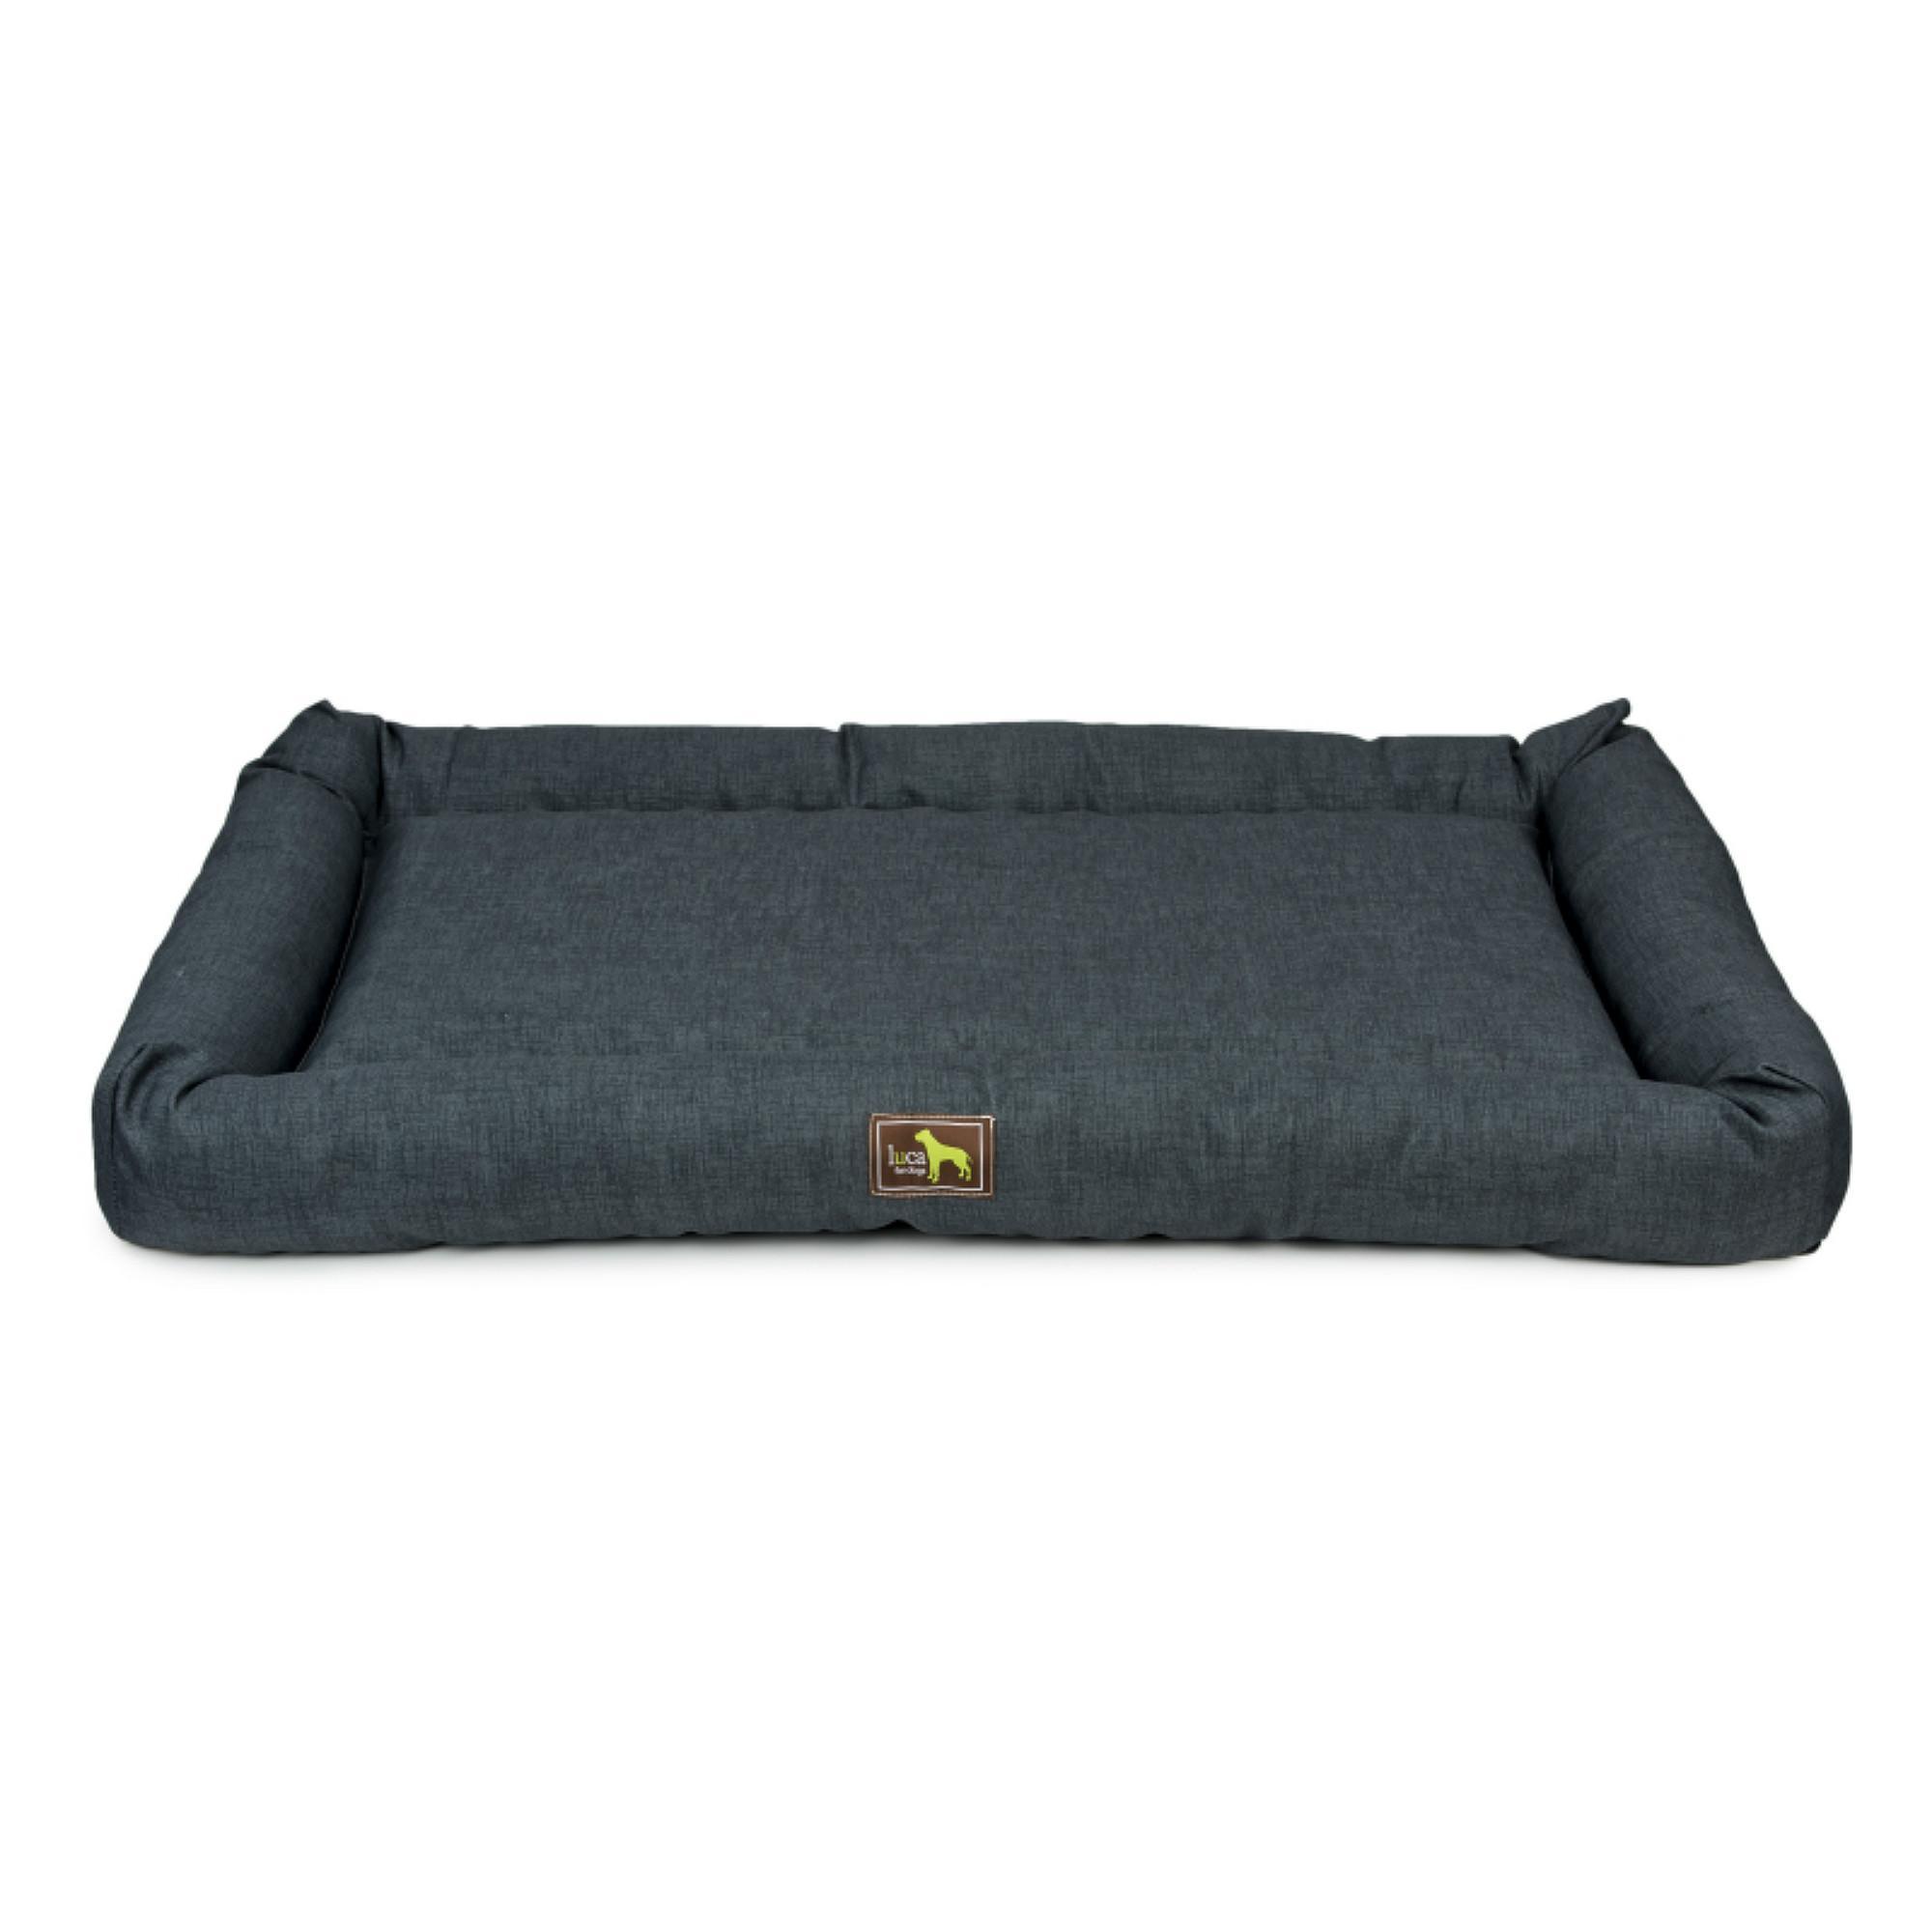 Luca Indoor/Outdoor Crate Cuddler Dog Bed - Charcoal